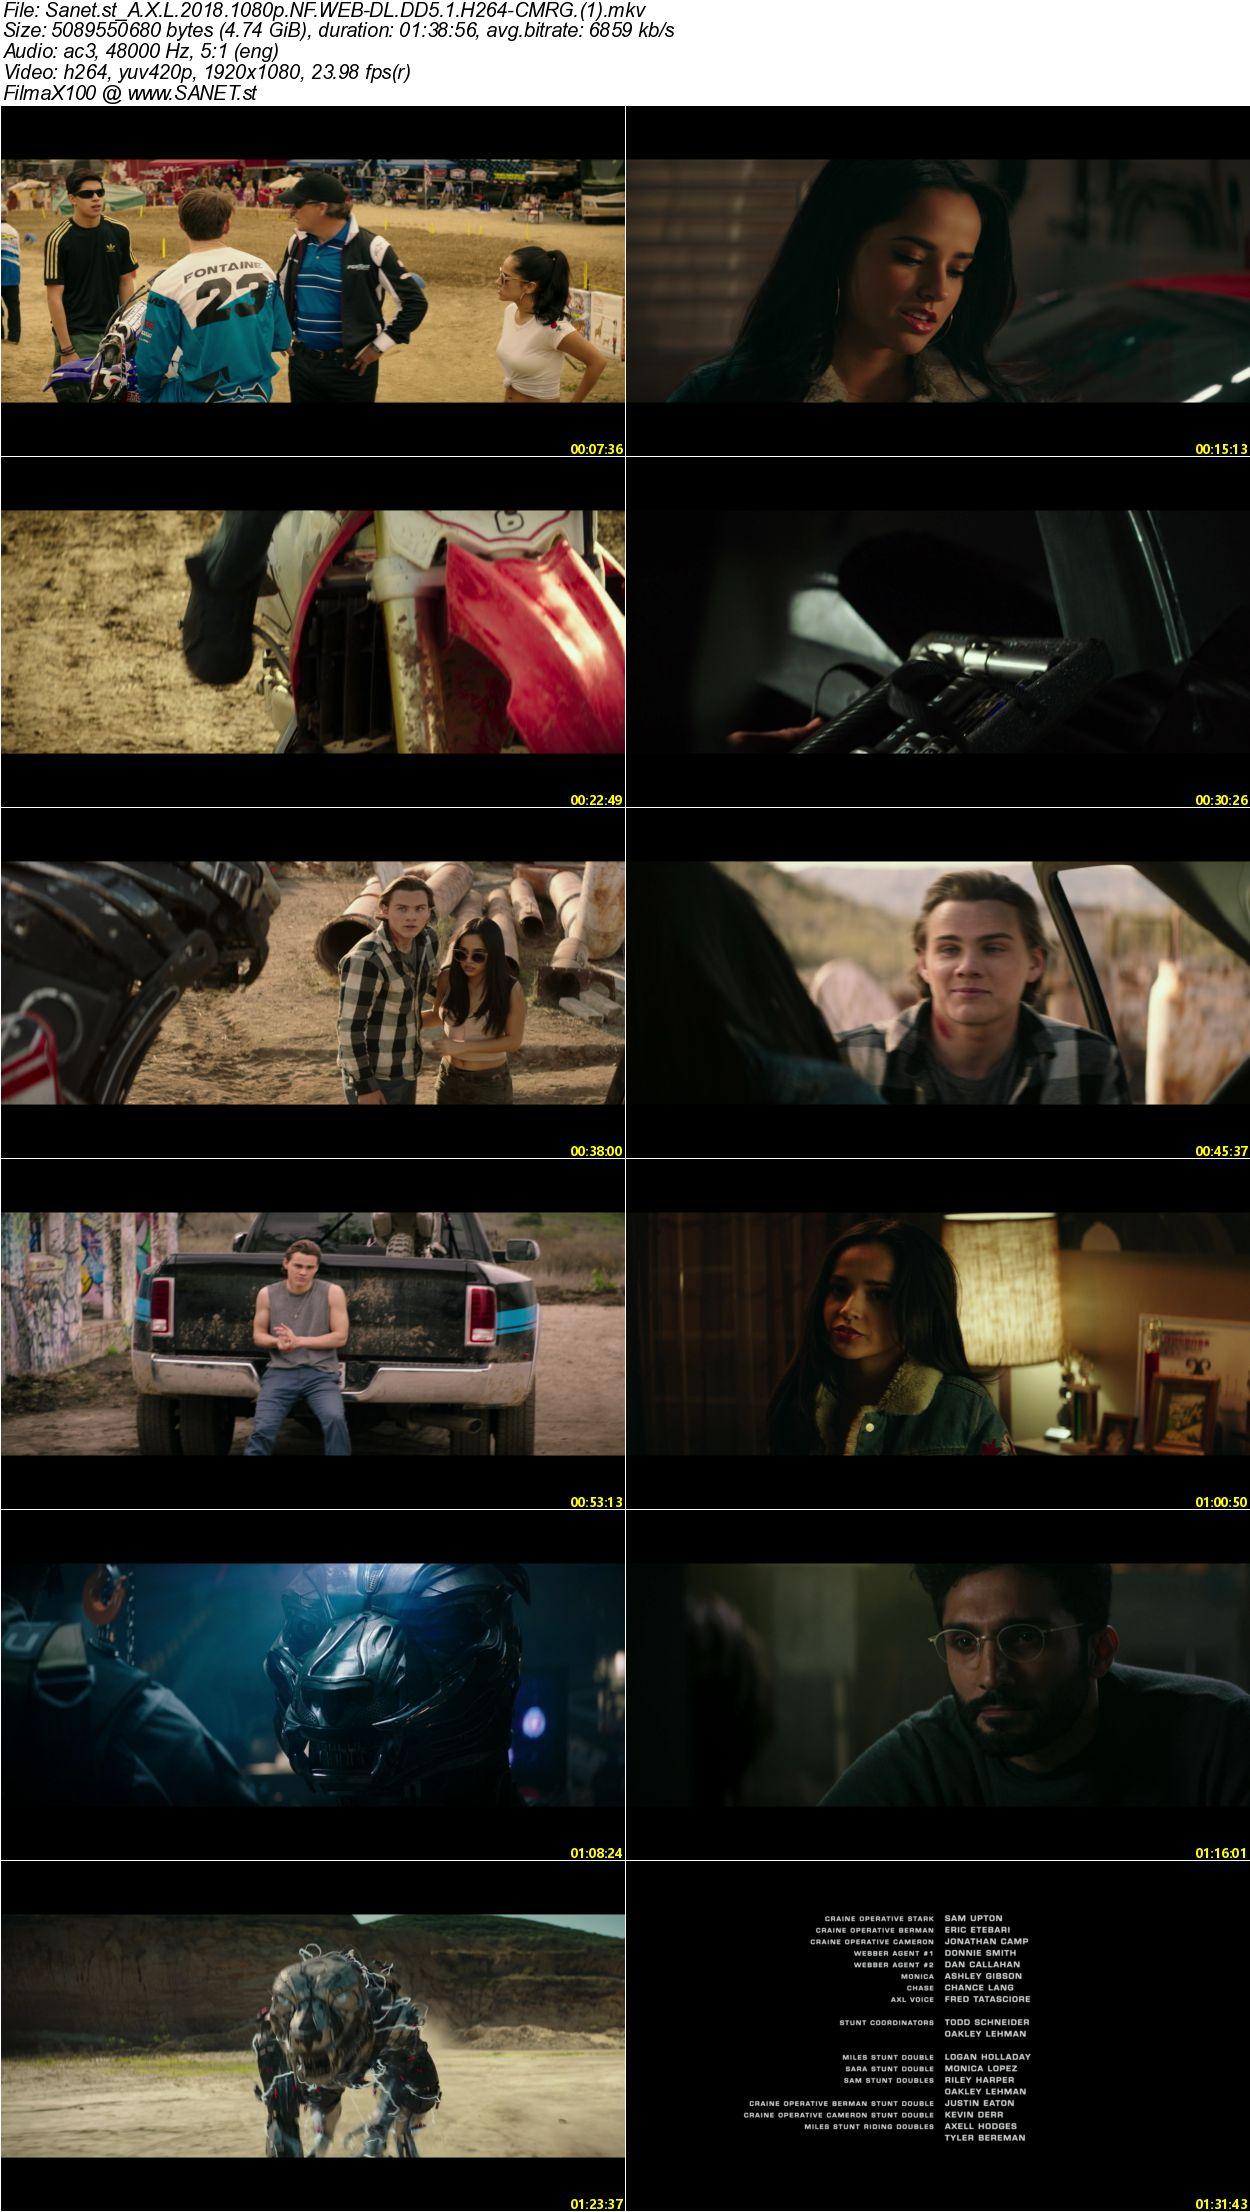 Axl Movie 2018 download a-x-l 2018 1080p nf web-dl dd5.1 h264-cmrg